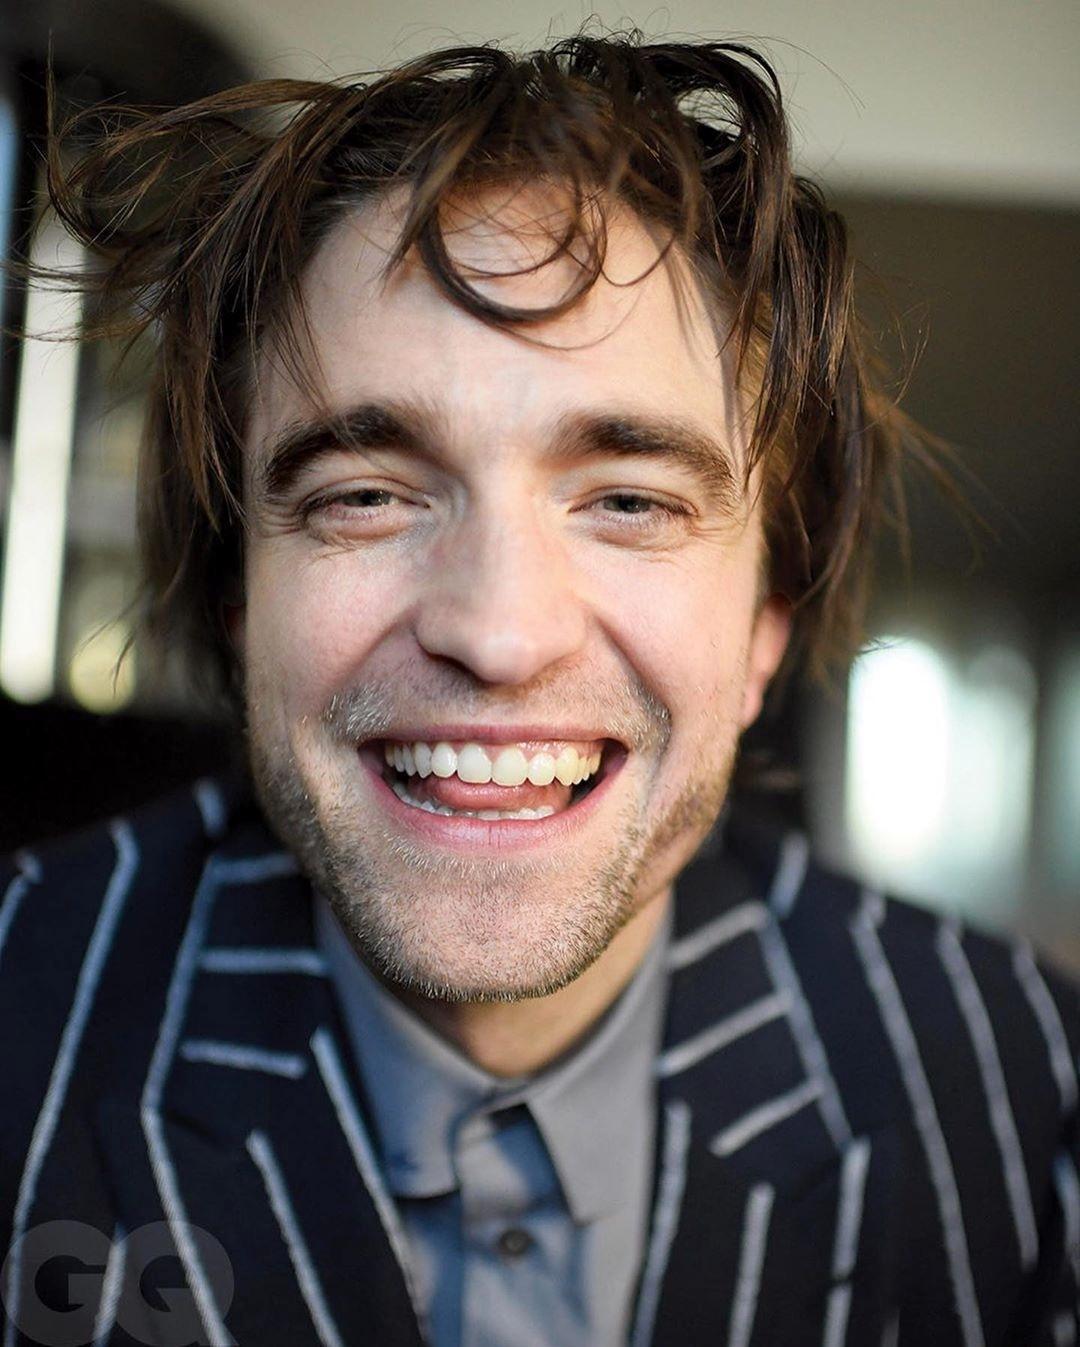 Robert Pattinson se autofotografa em isolamento e fãs se identificam